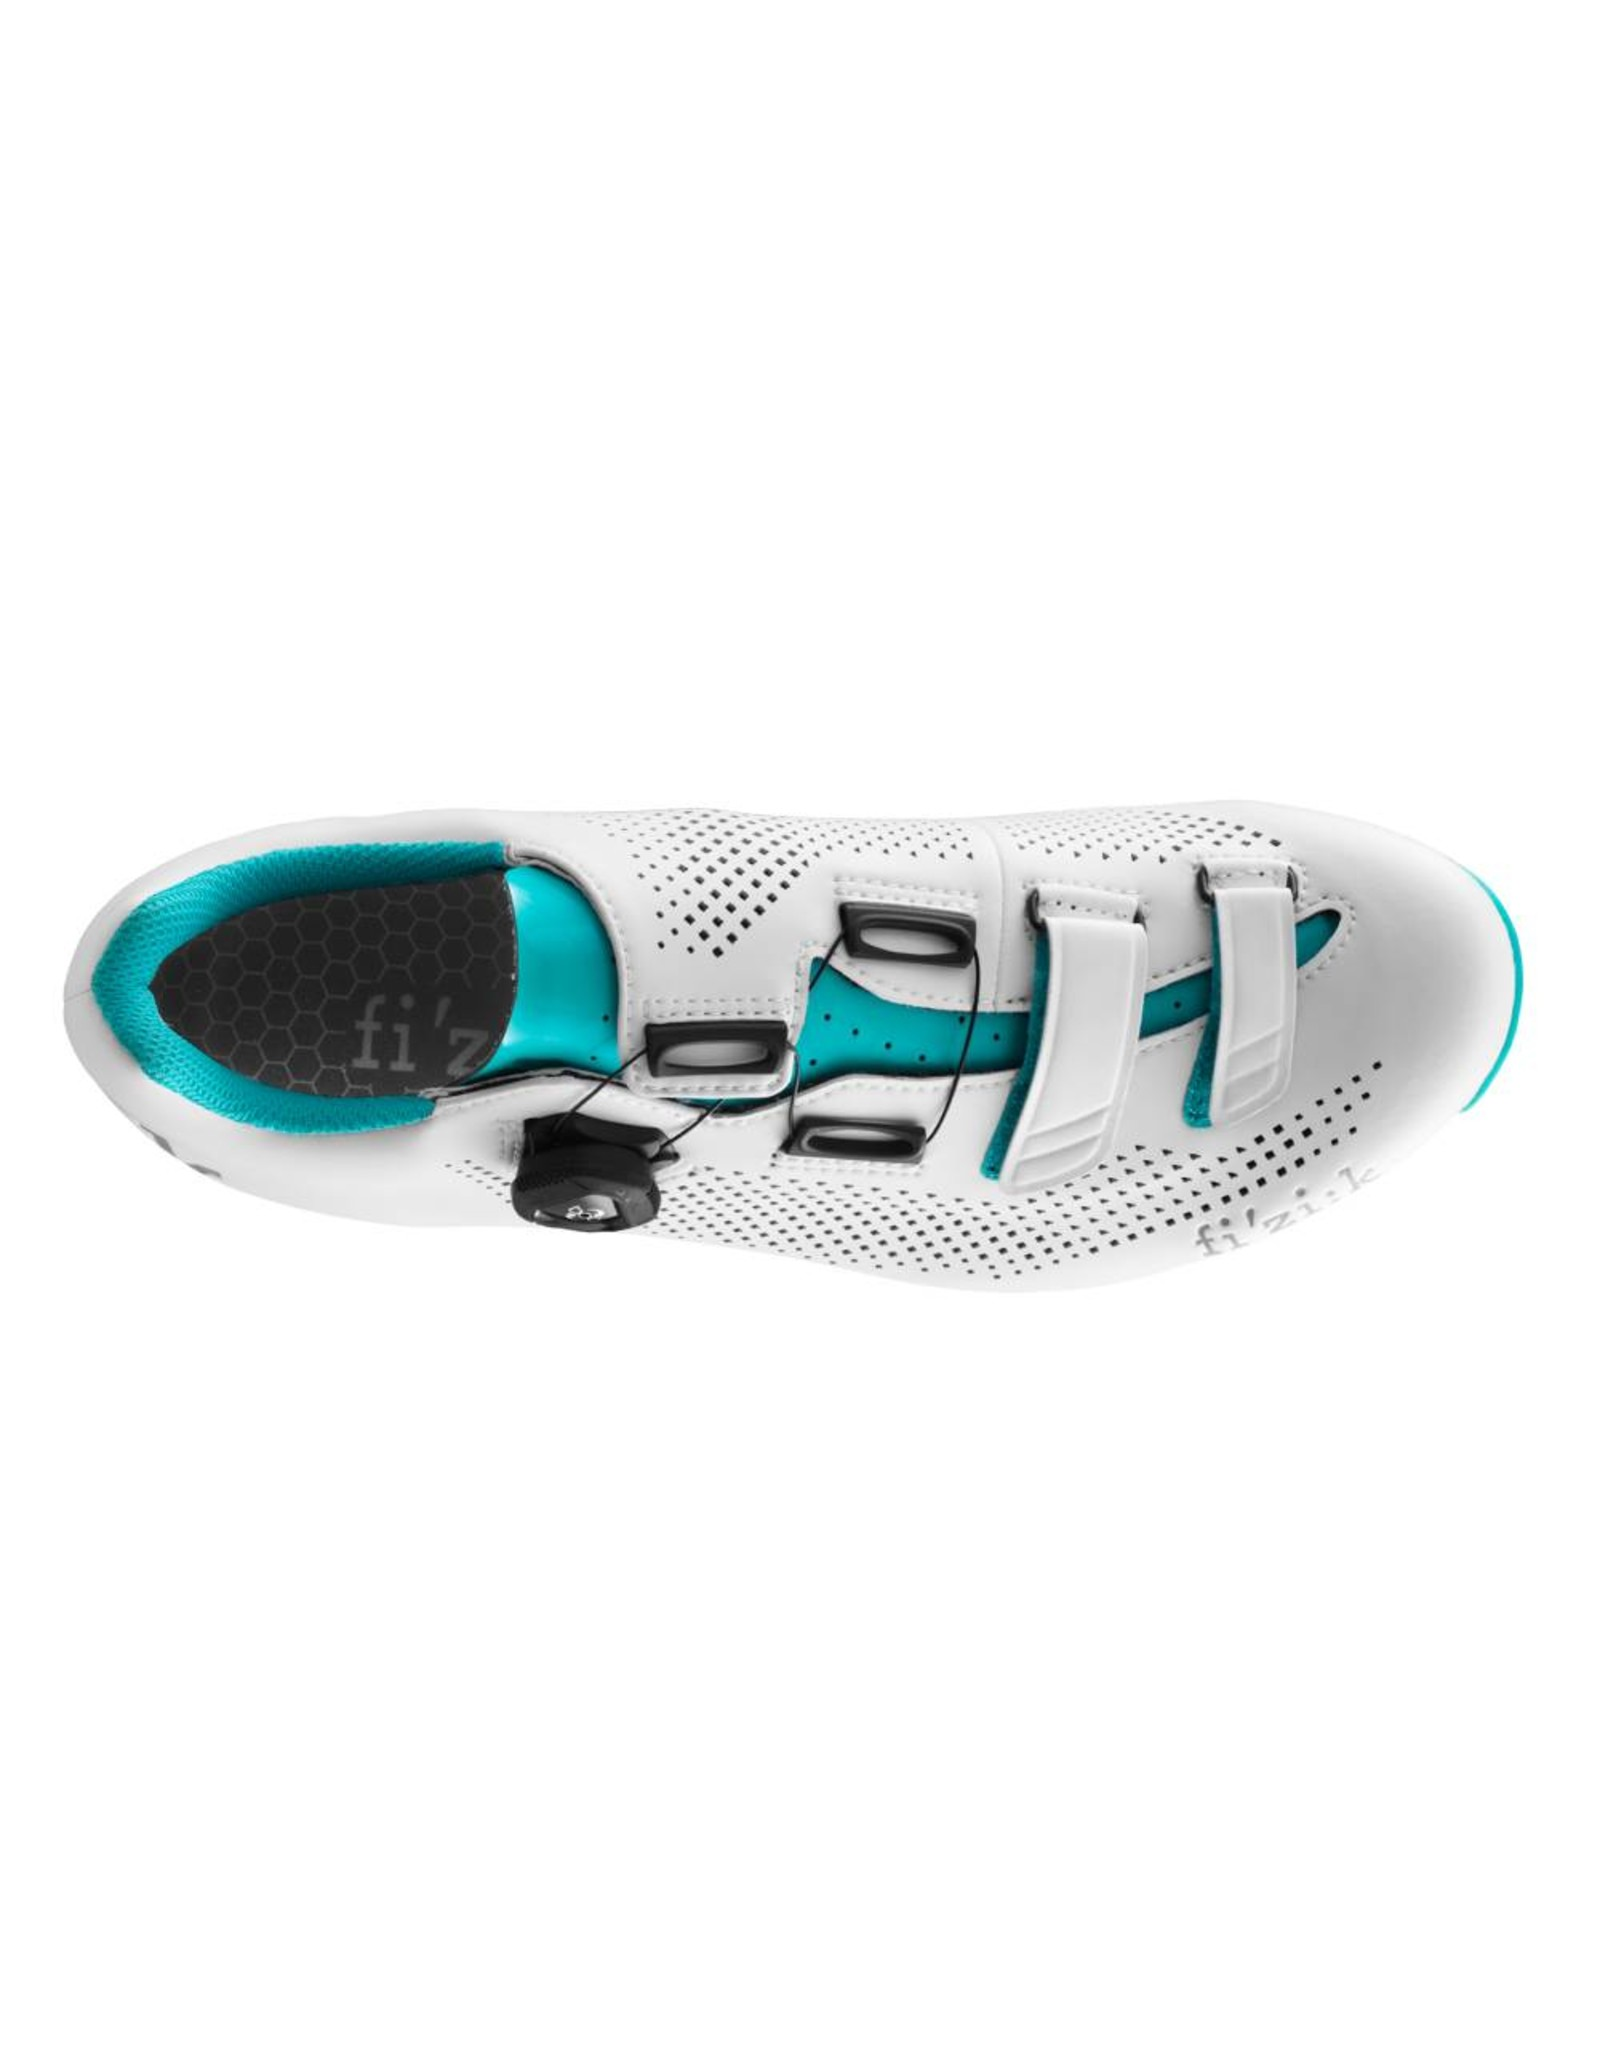 FIZIK Fizik R4B Shoe